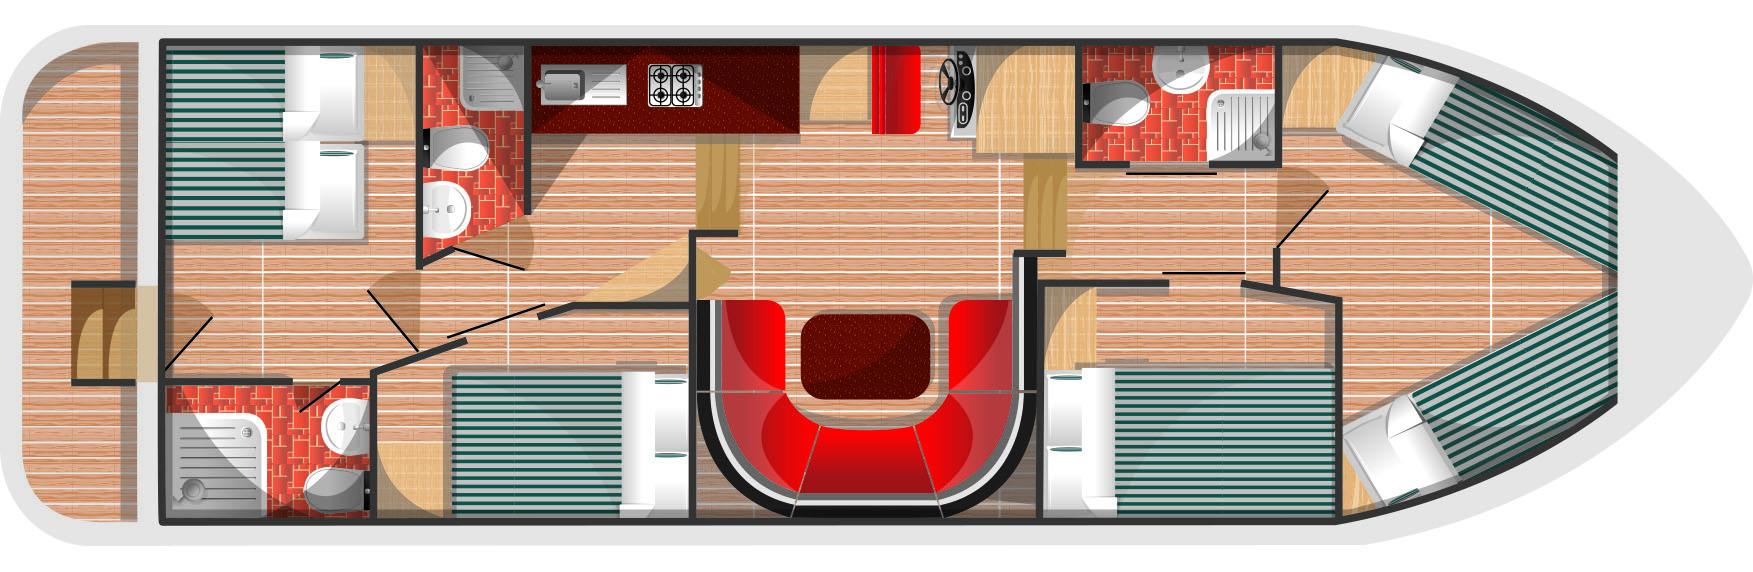 Floorplan for Fair Emperor